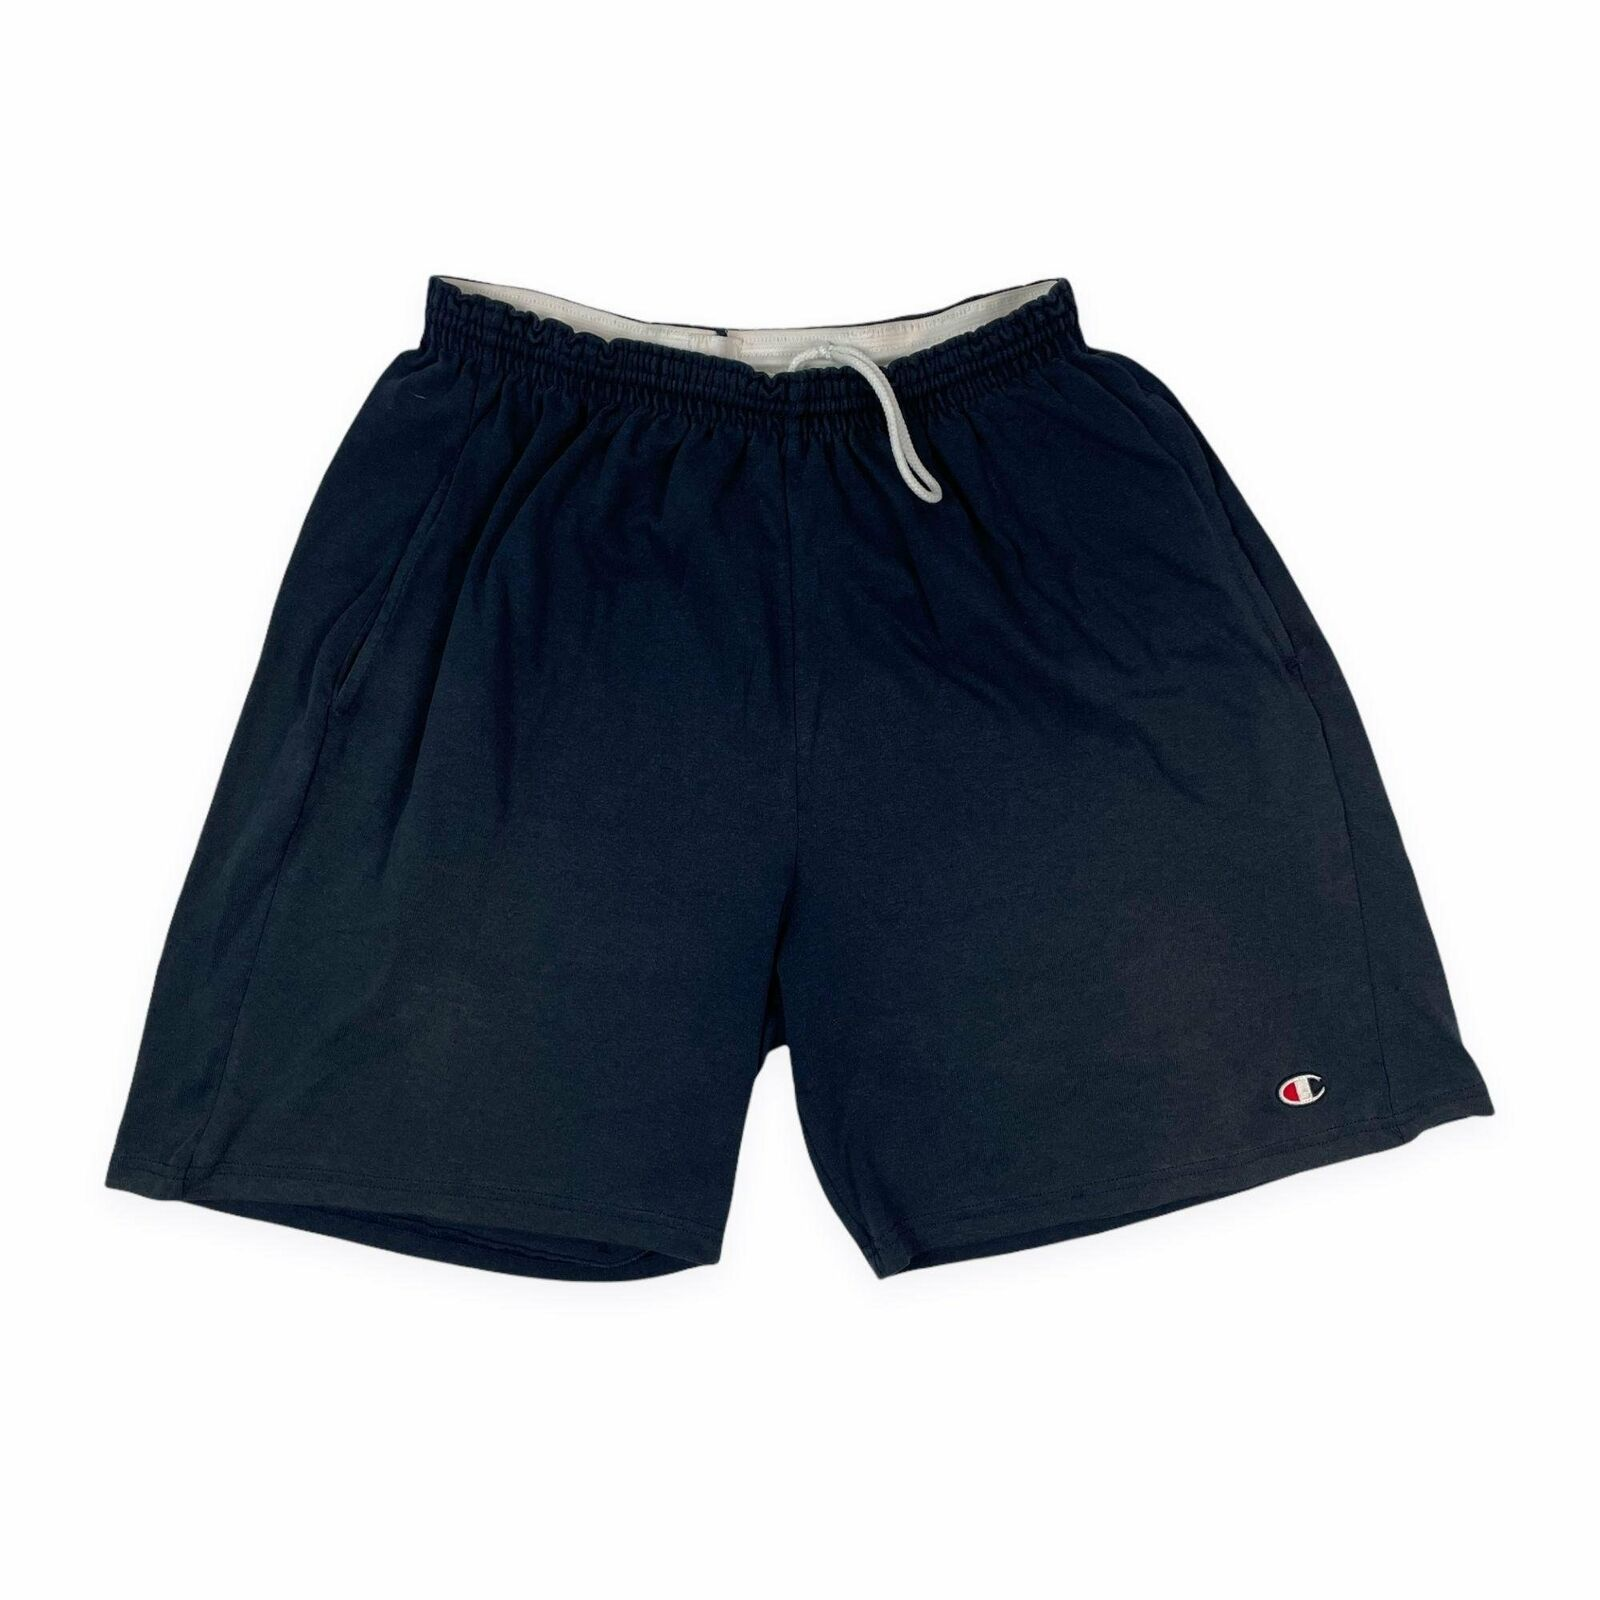 Vintage 90s Champion Shorts - image 1